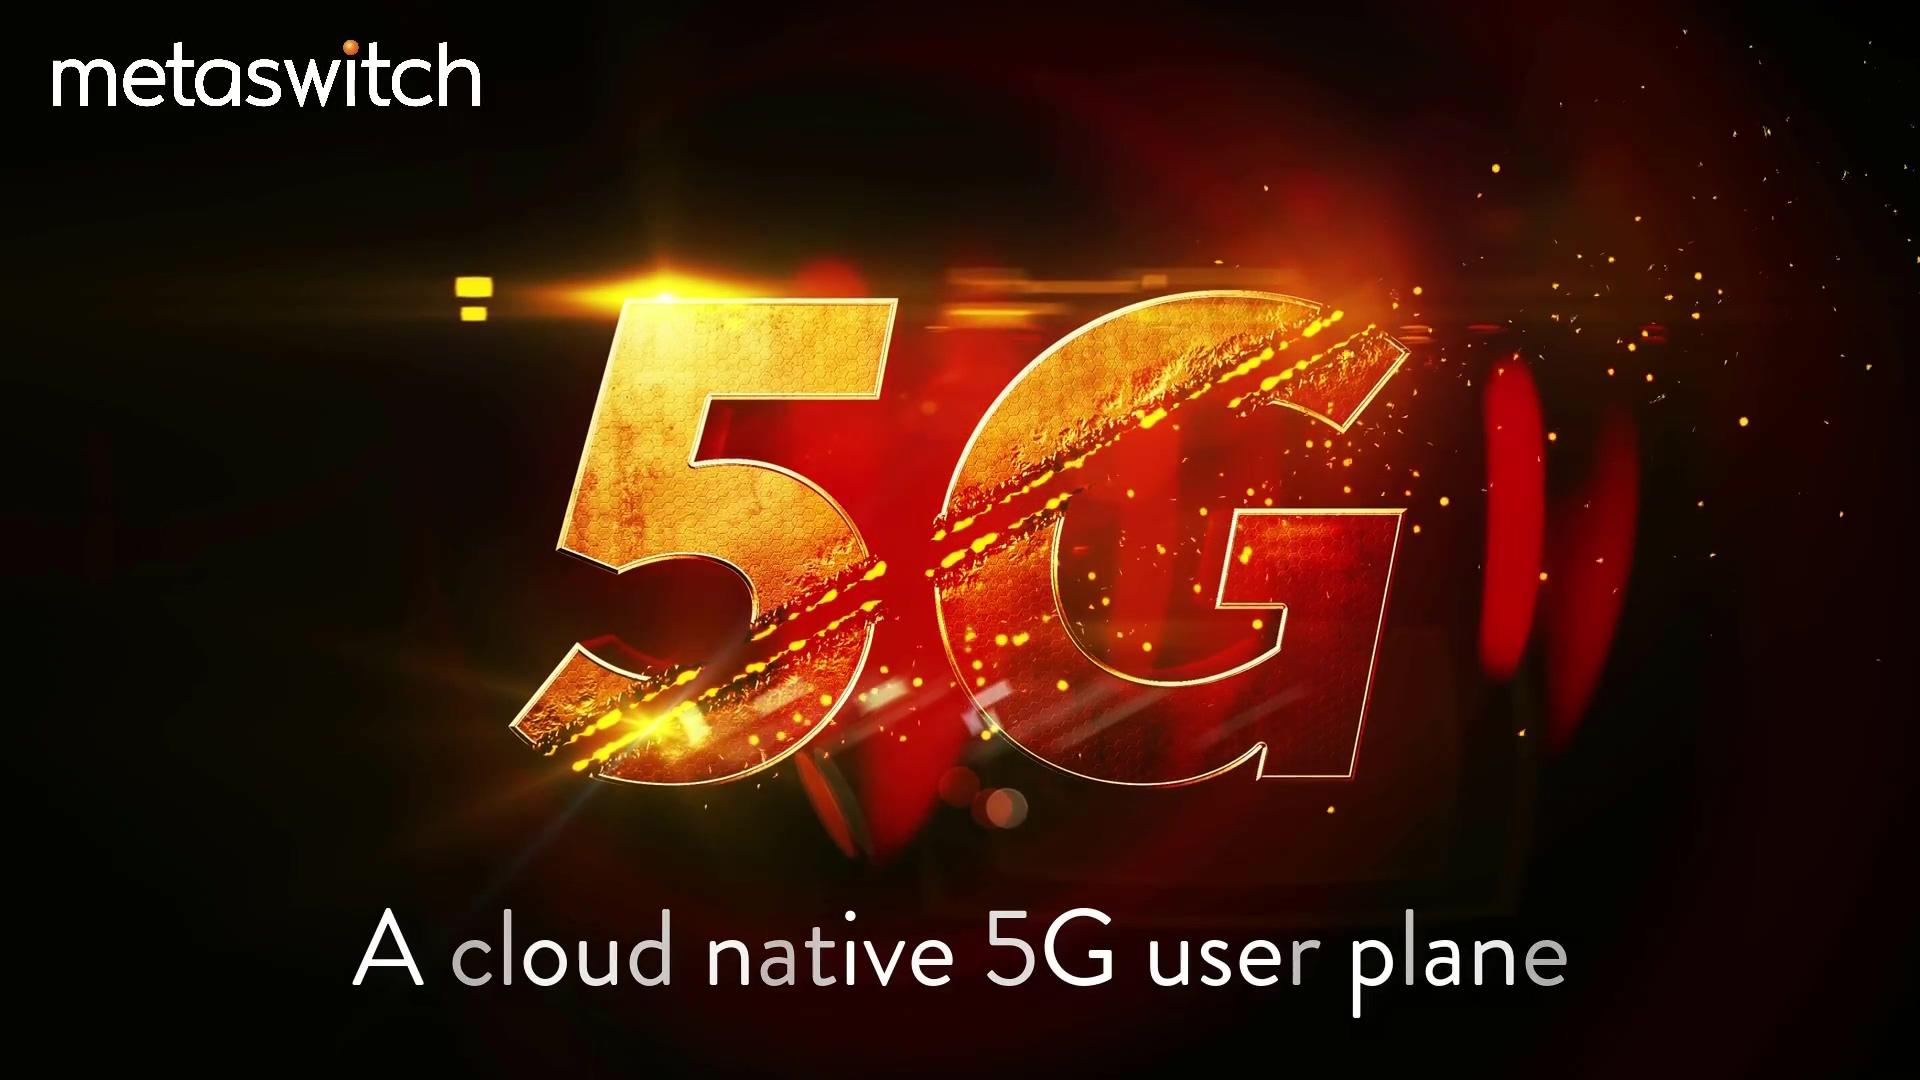 martin-taylor-soundbite-a-cloud-native-5G-user-plane